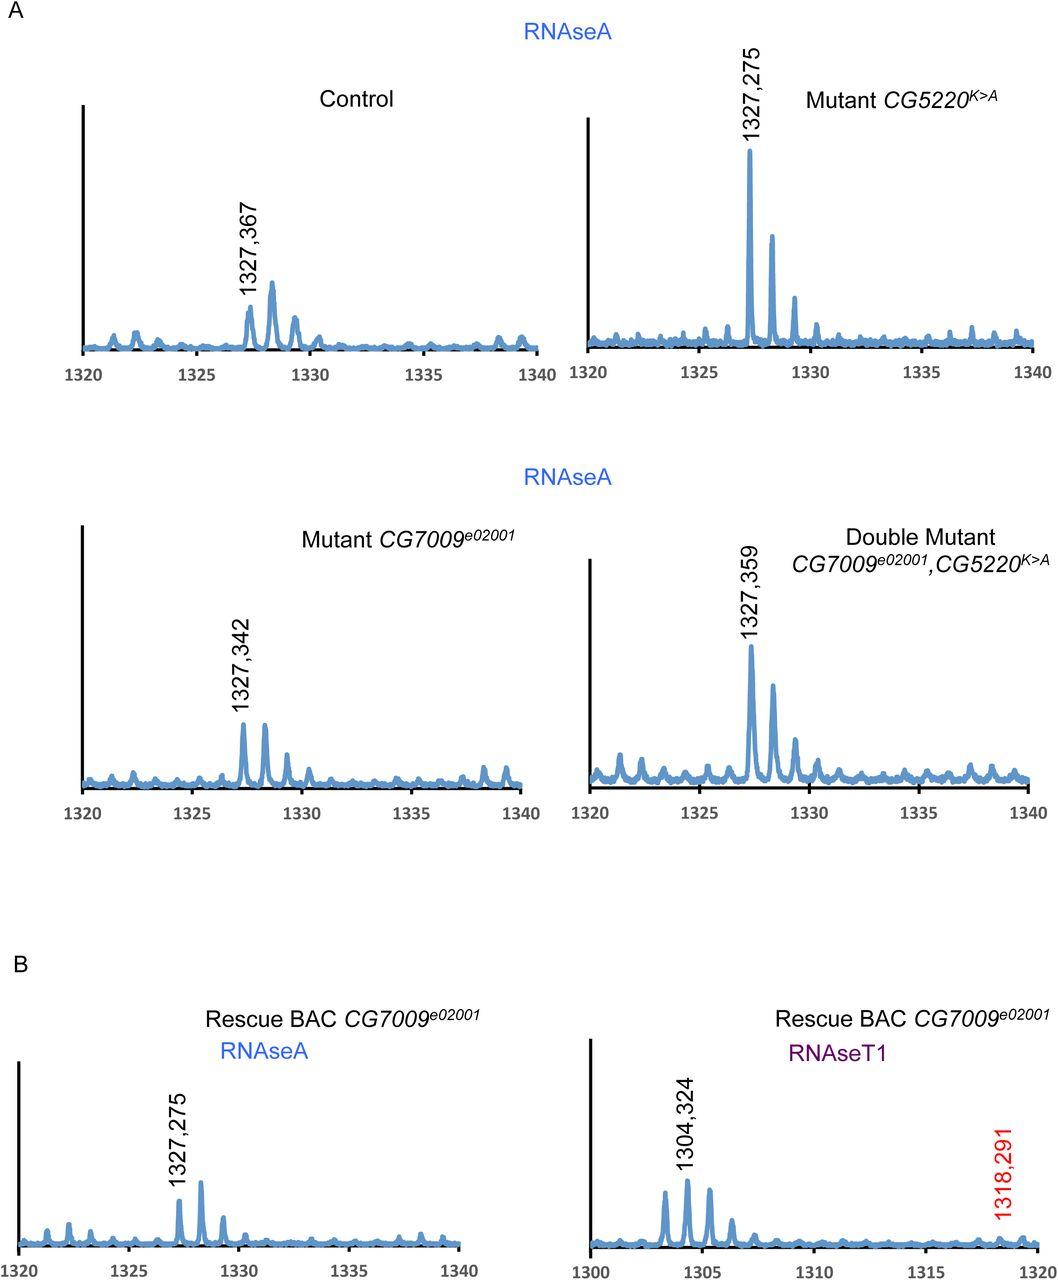 tRNA 2'-O-methylation modulates small RNA silencing and life span in on